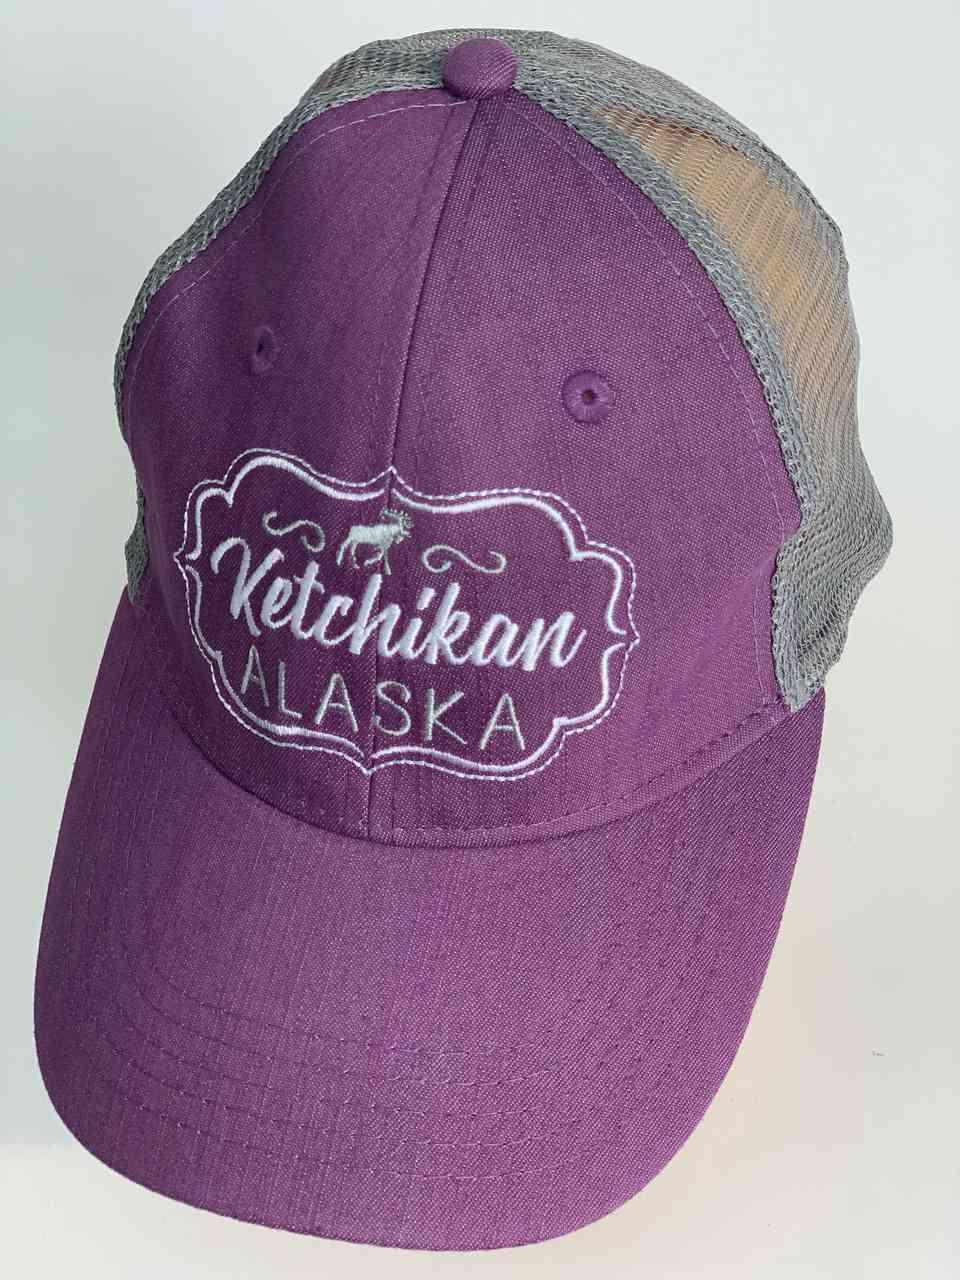 Сиреневая мужская бейсболка KETCHIKAN Alaska